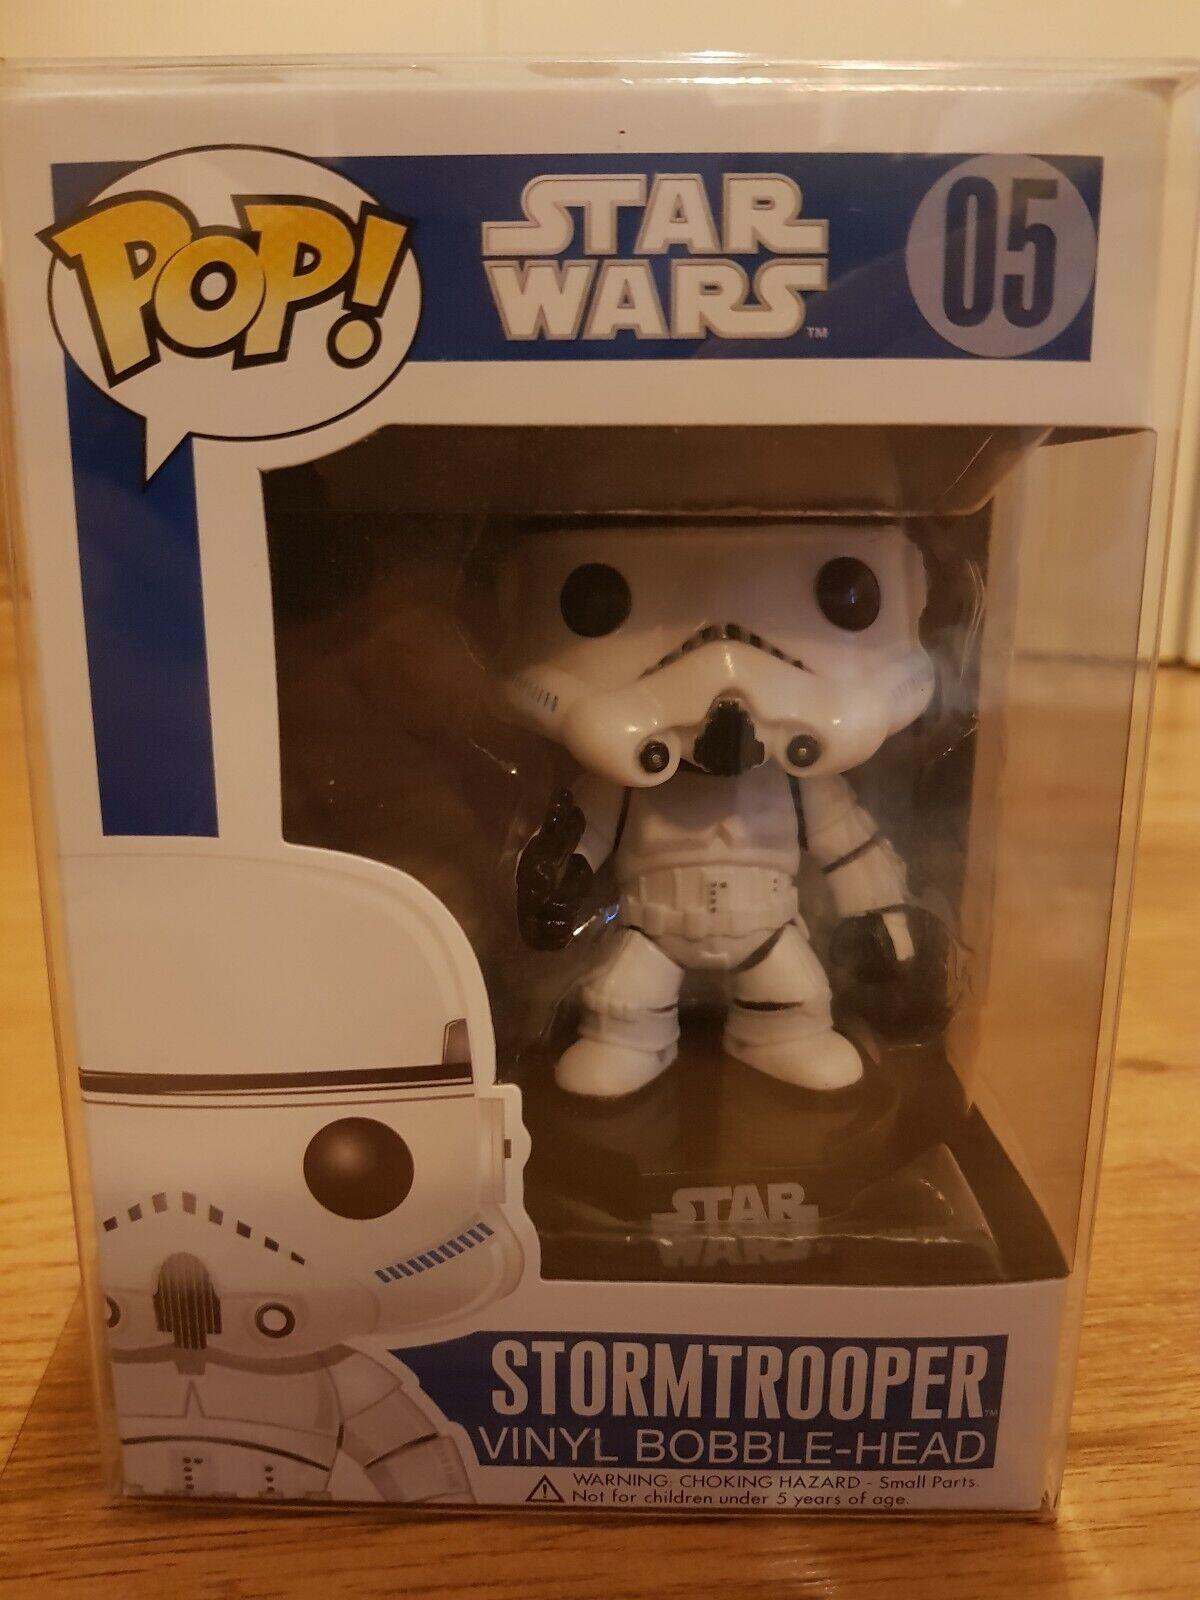 Diverdeimentoko Pop Vinile estrella guerras-Stormtrooper (05) L7   fabbrica diretta